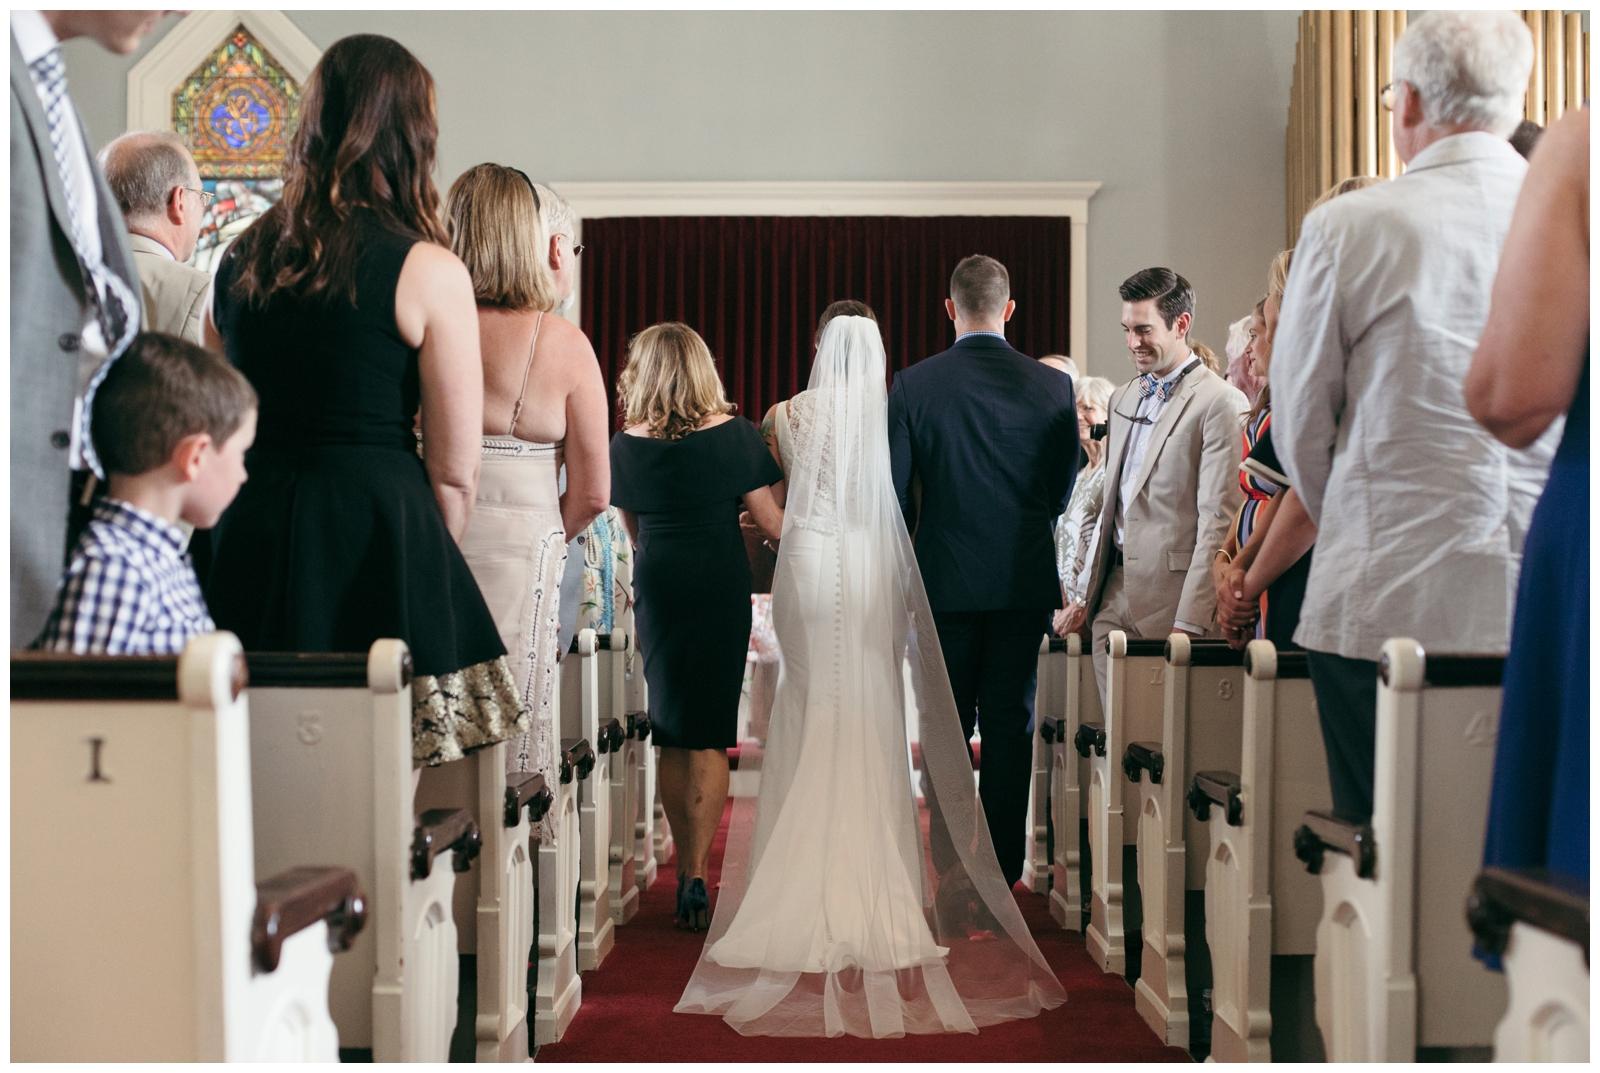 Bailey-Q-Photo-Backyard-Wedding-South-Shore-Boston-Wedding-Photographer-042.jpg